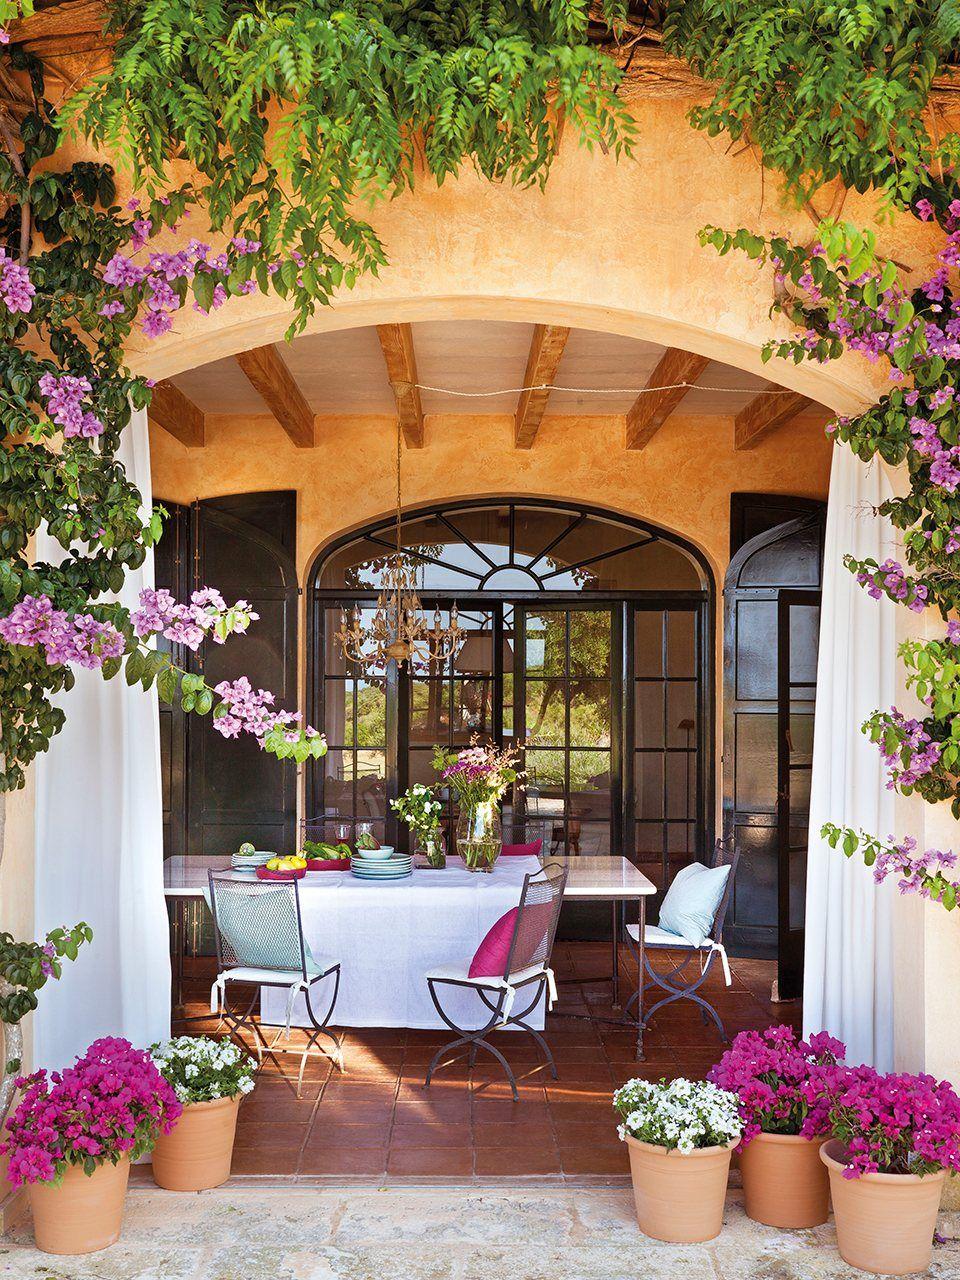 Comedor de verano la casa est rodeada de porches que - Porches de casas ...